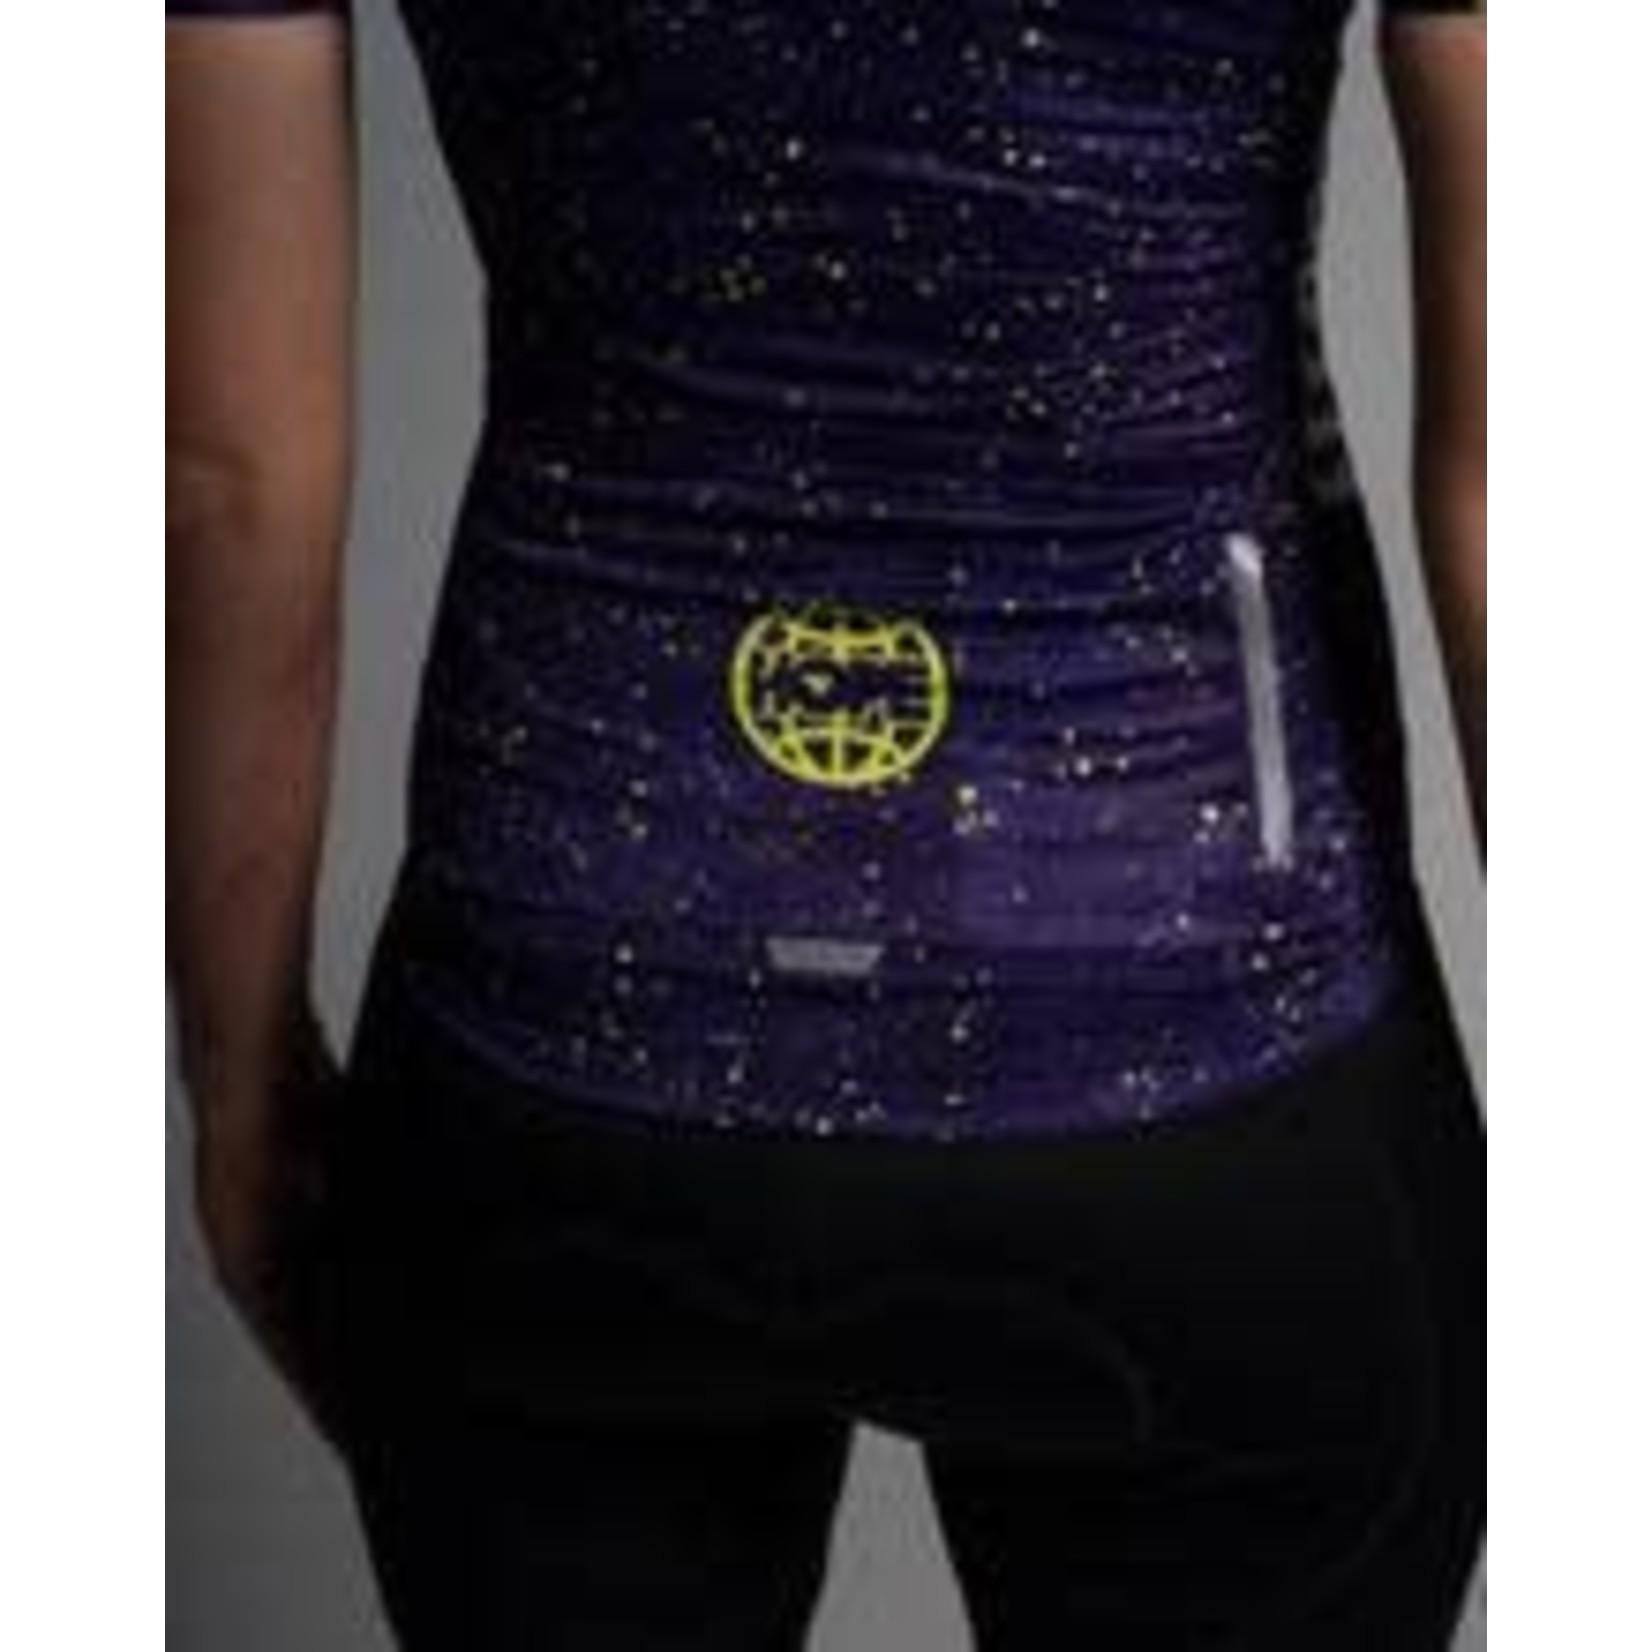 Pedal Mafia PM x OC Drop Cloth Purple Women's Cycling Jersey